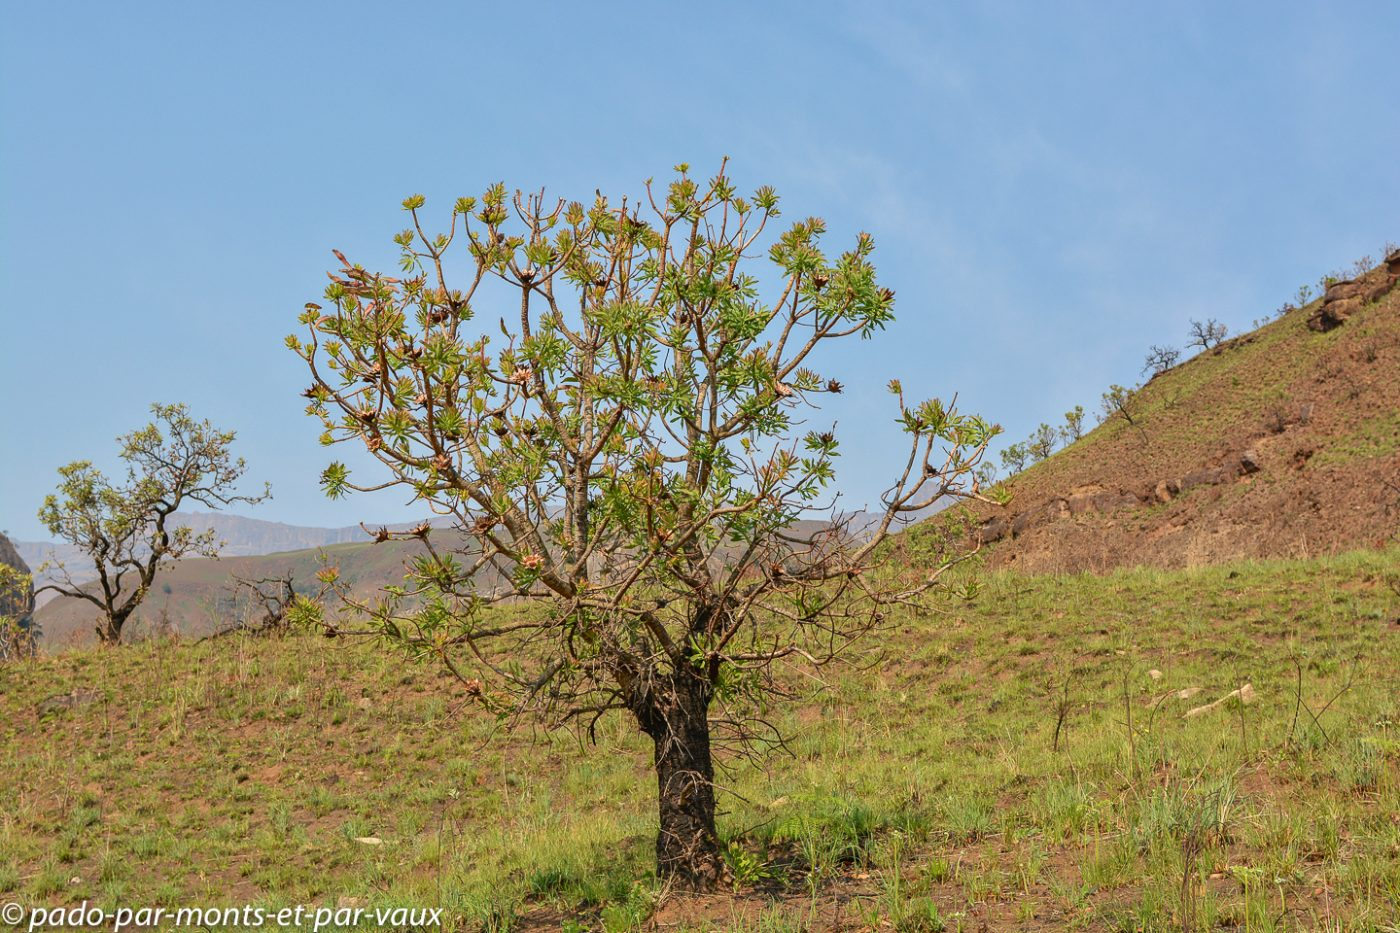 Drakensberg - protea